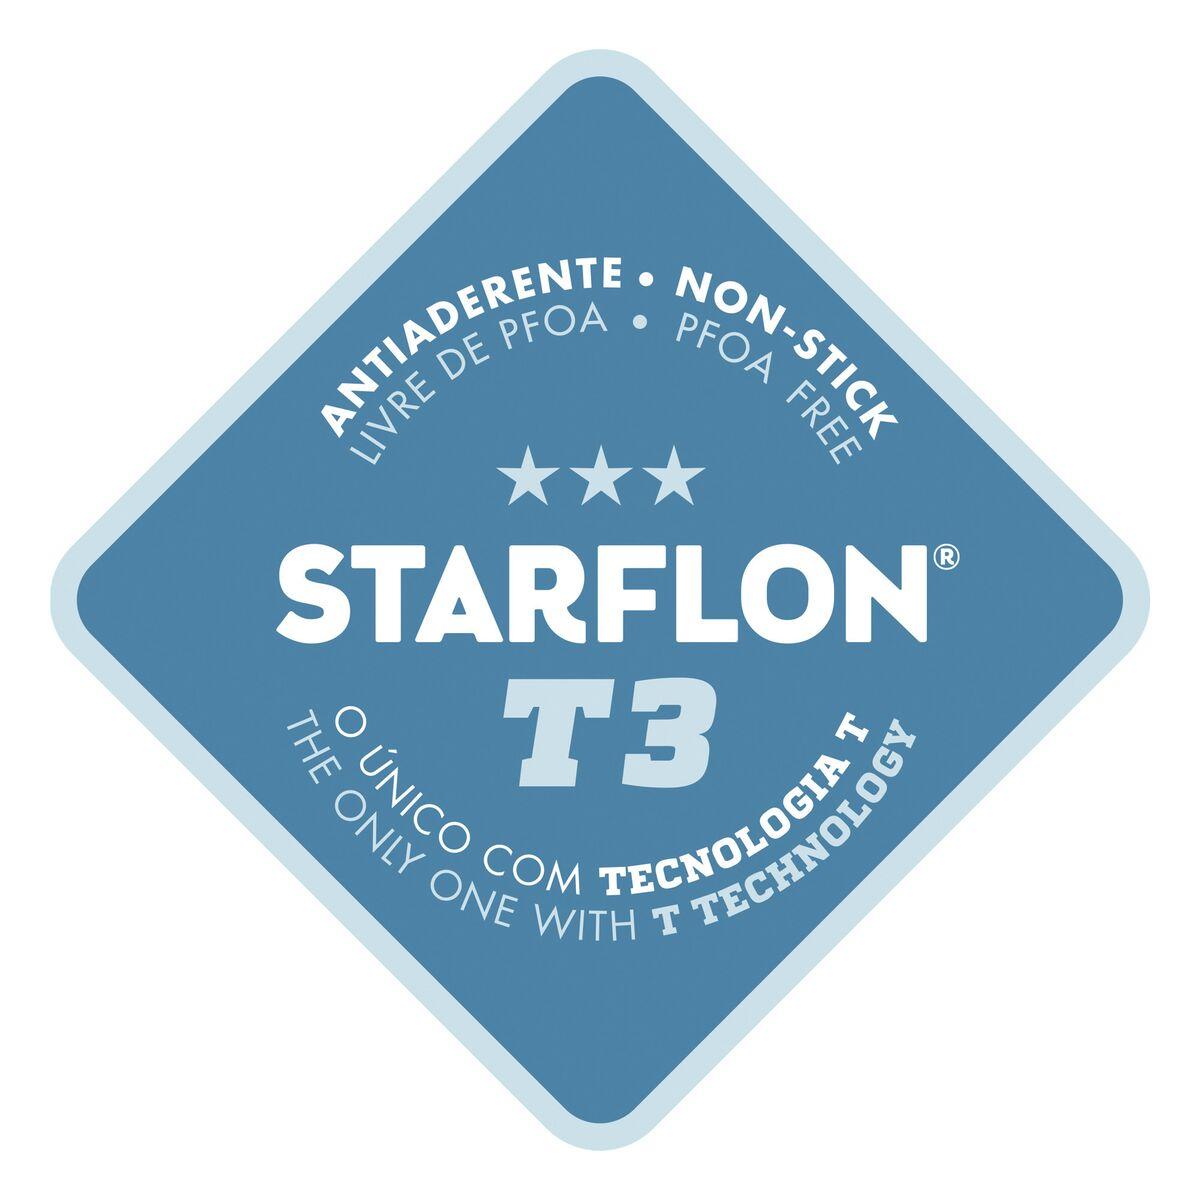 Caçarola Retangular Tramontina Refinatta em Alumínio Antiaderente Starflon T3 com Tampa Vermelha 24 cm 4,8 L